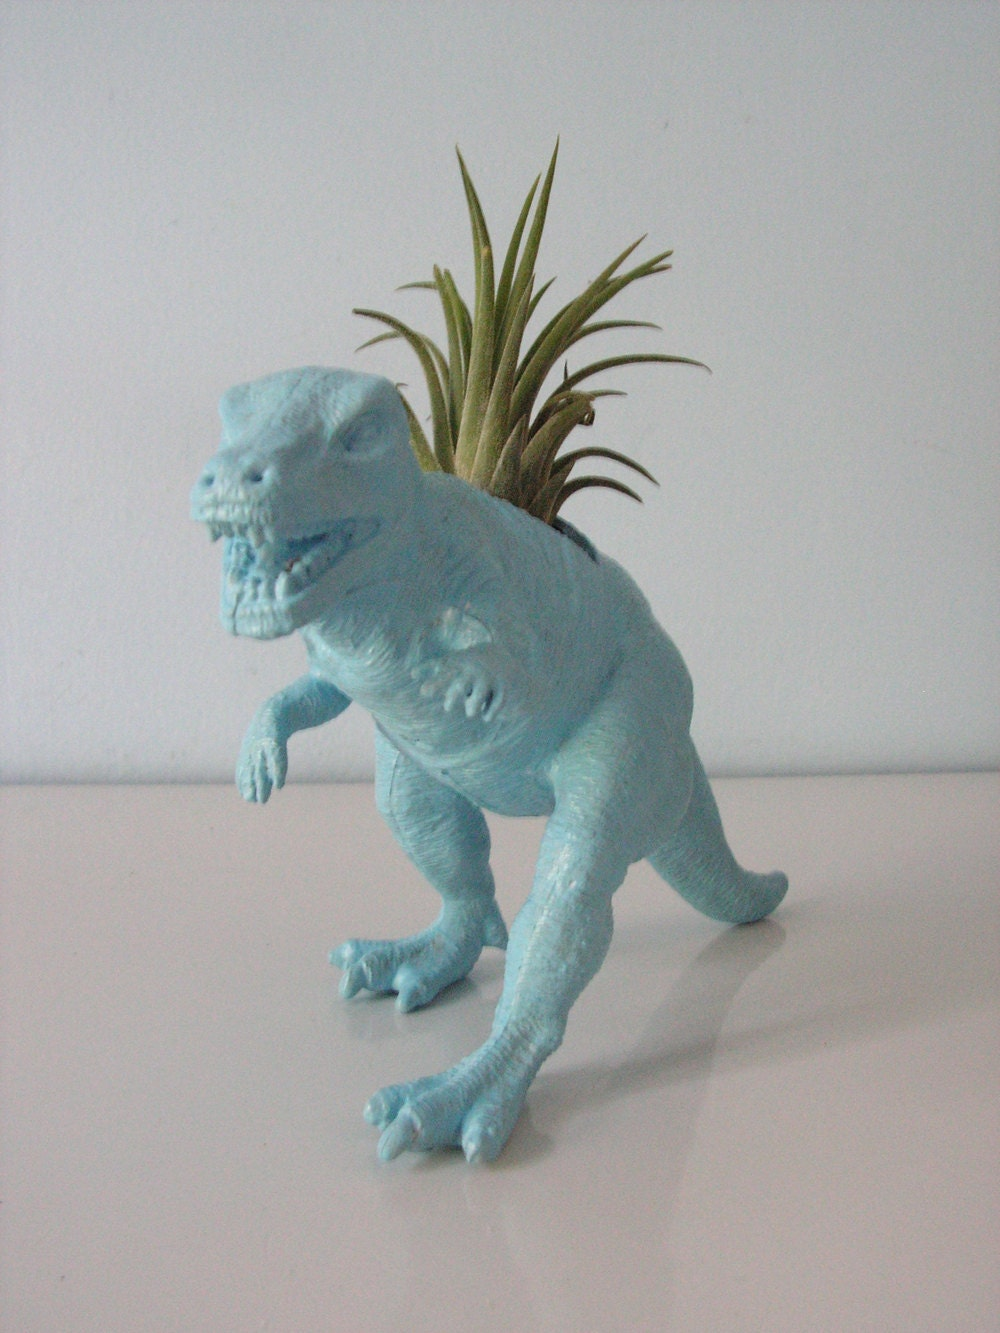 Upcycled Dinosaur Planter Blue Tyrannosaurus Rex With